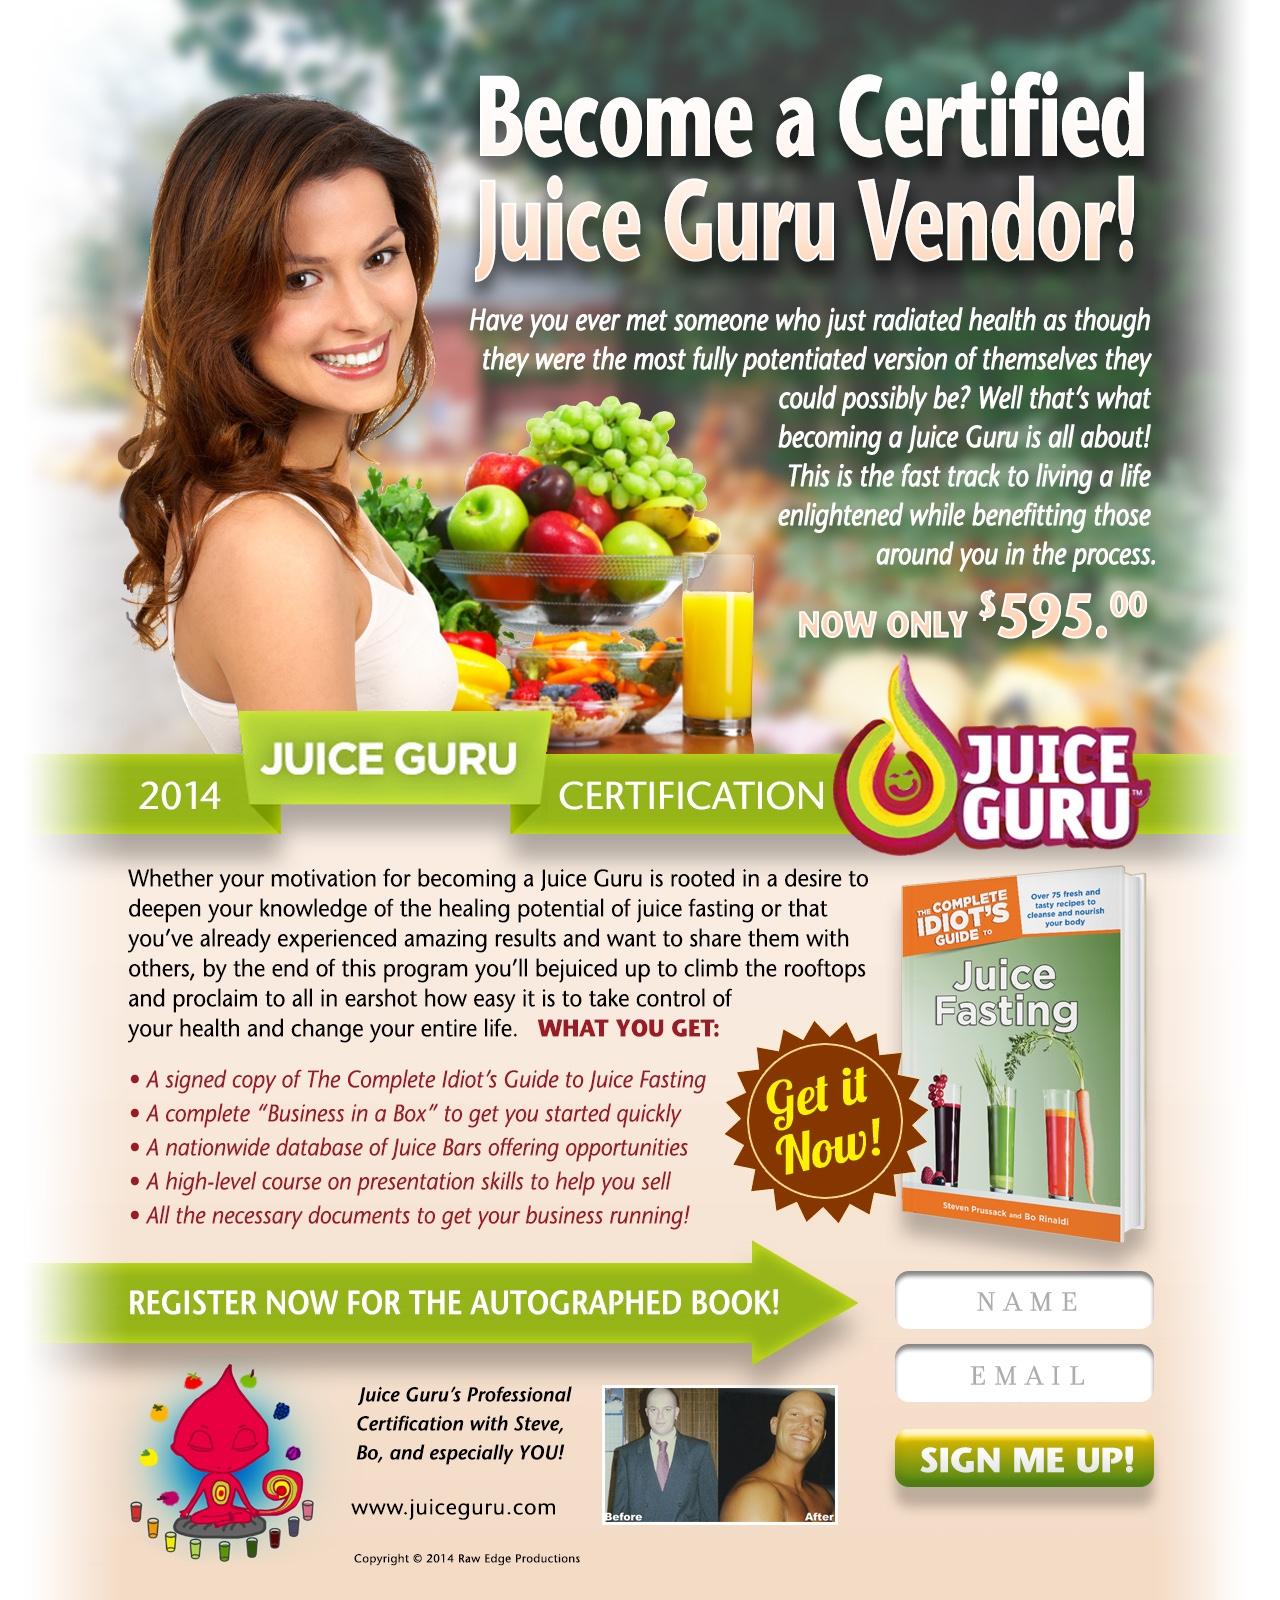 Juice Guru Certification